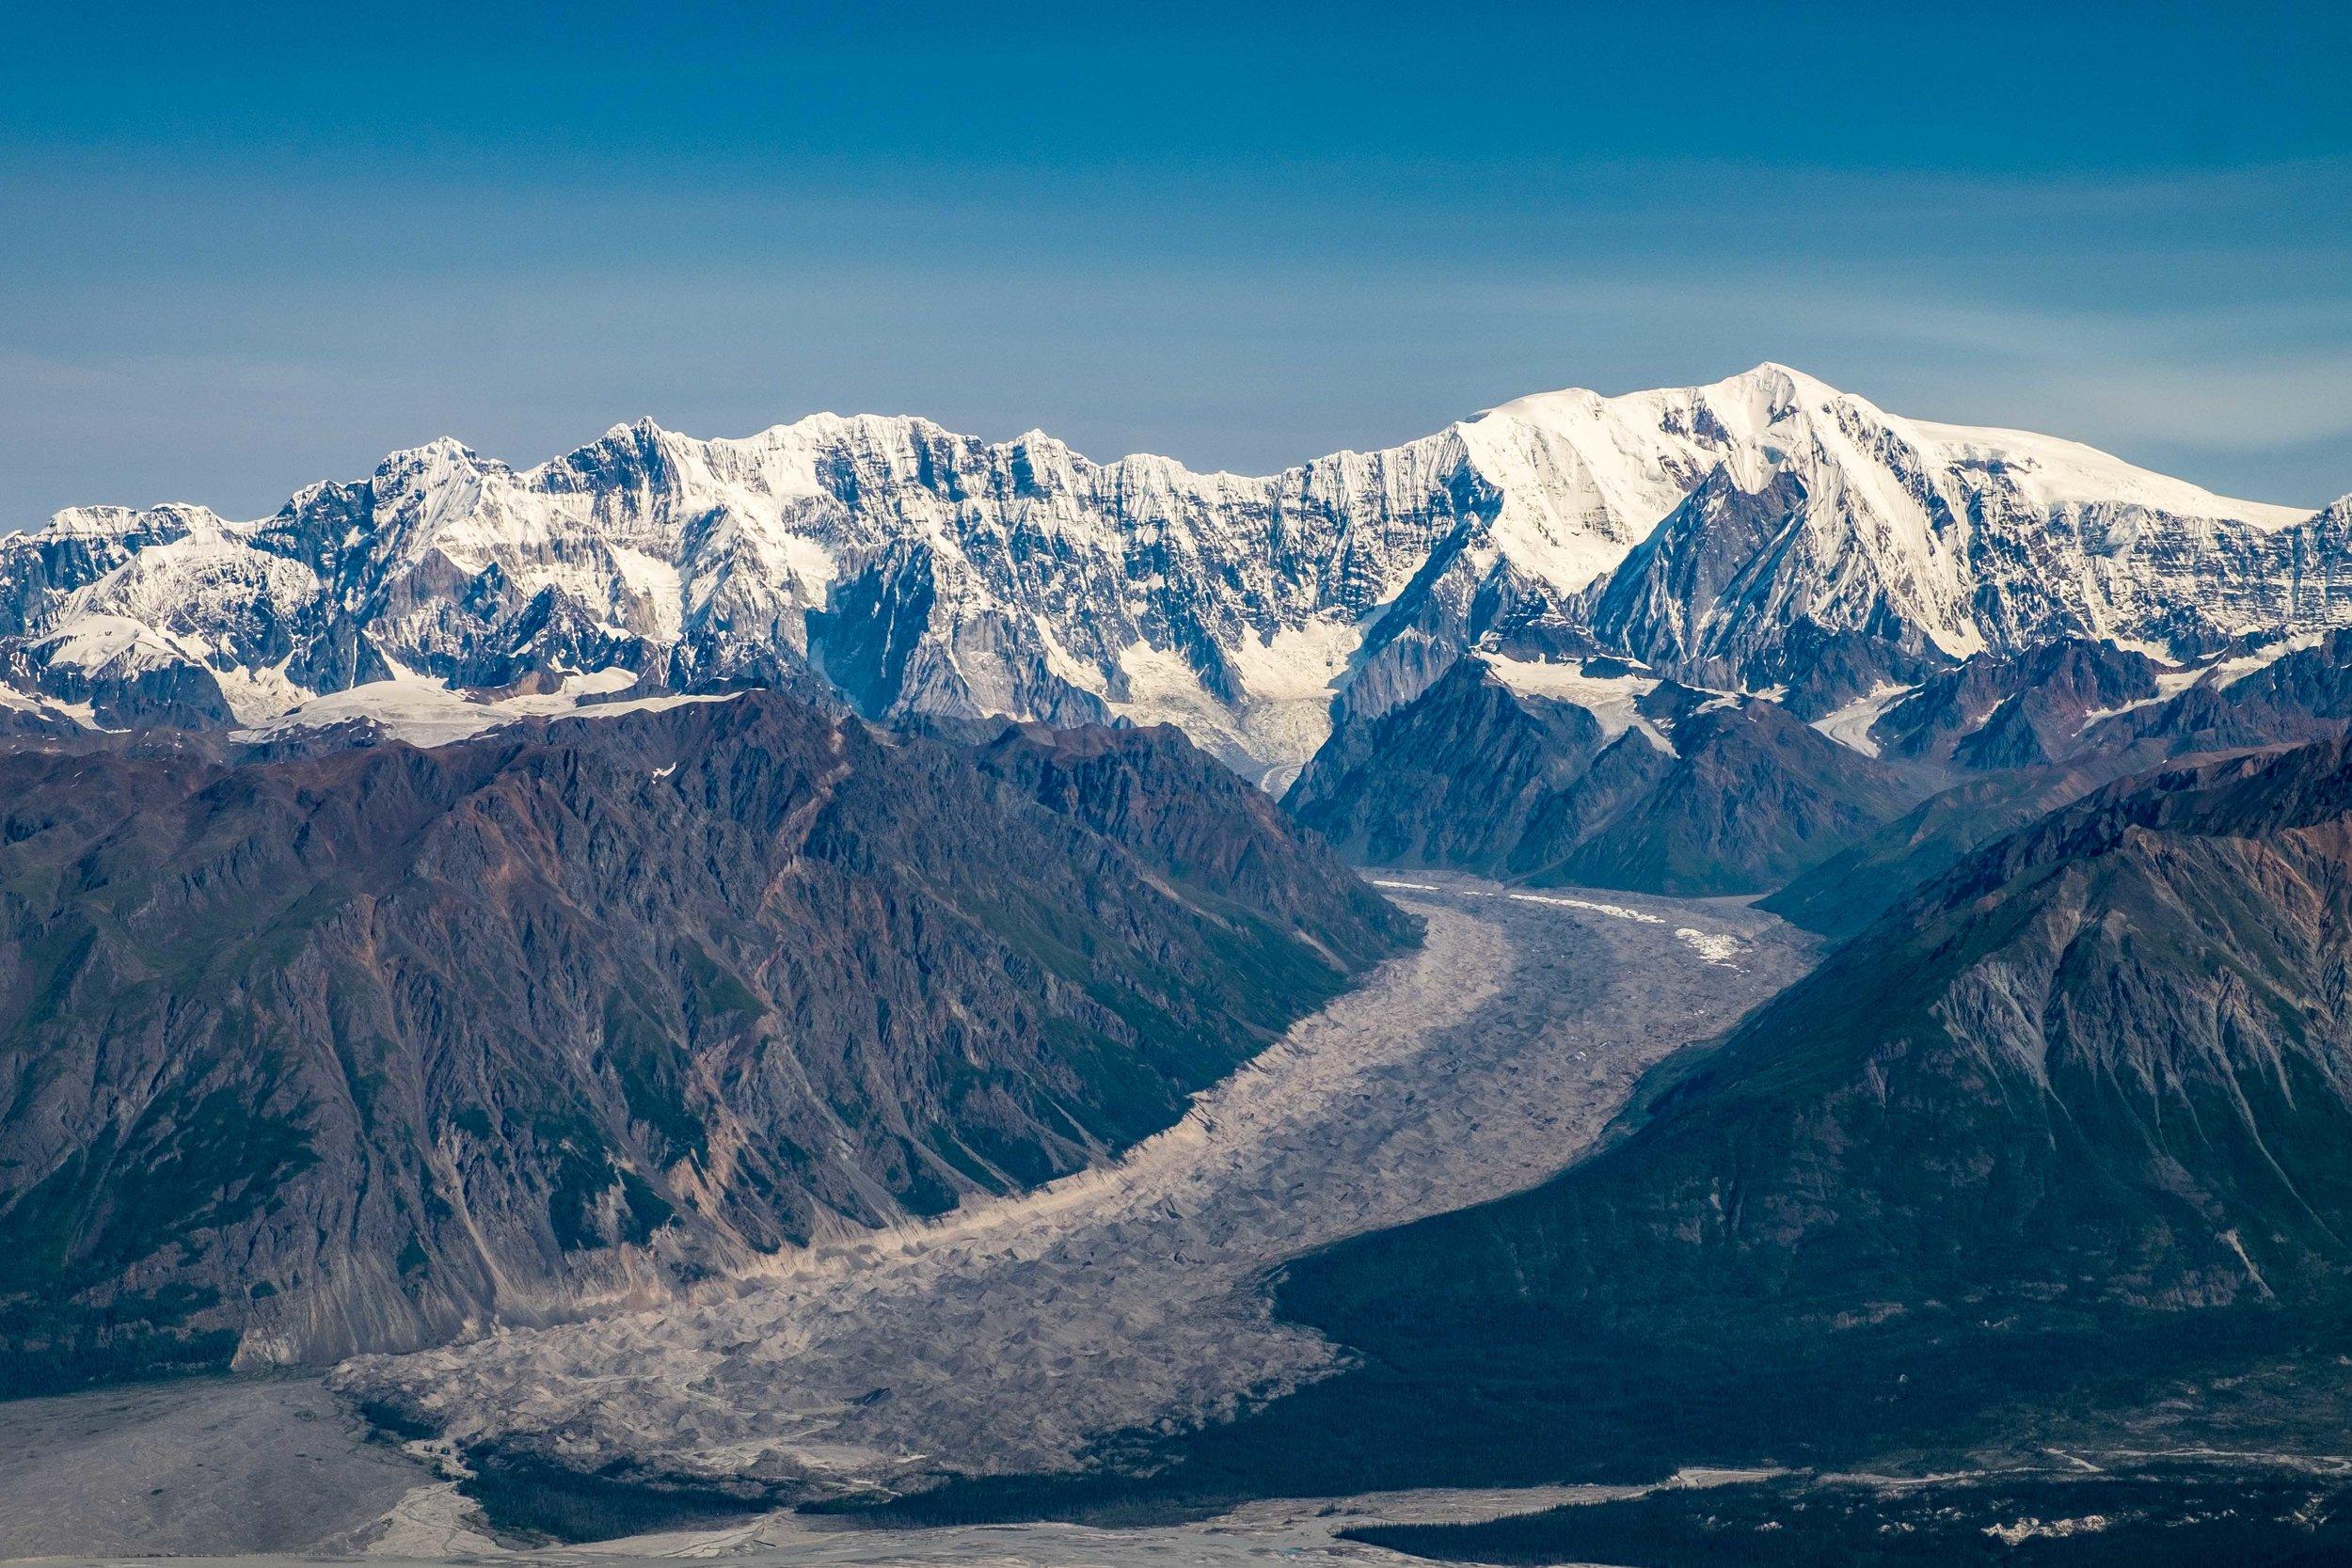 20160731-JI-Wrangell St Elias National Park-_DSF1397.jpg